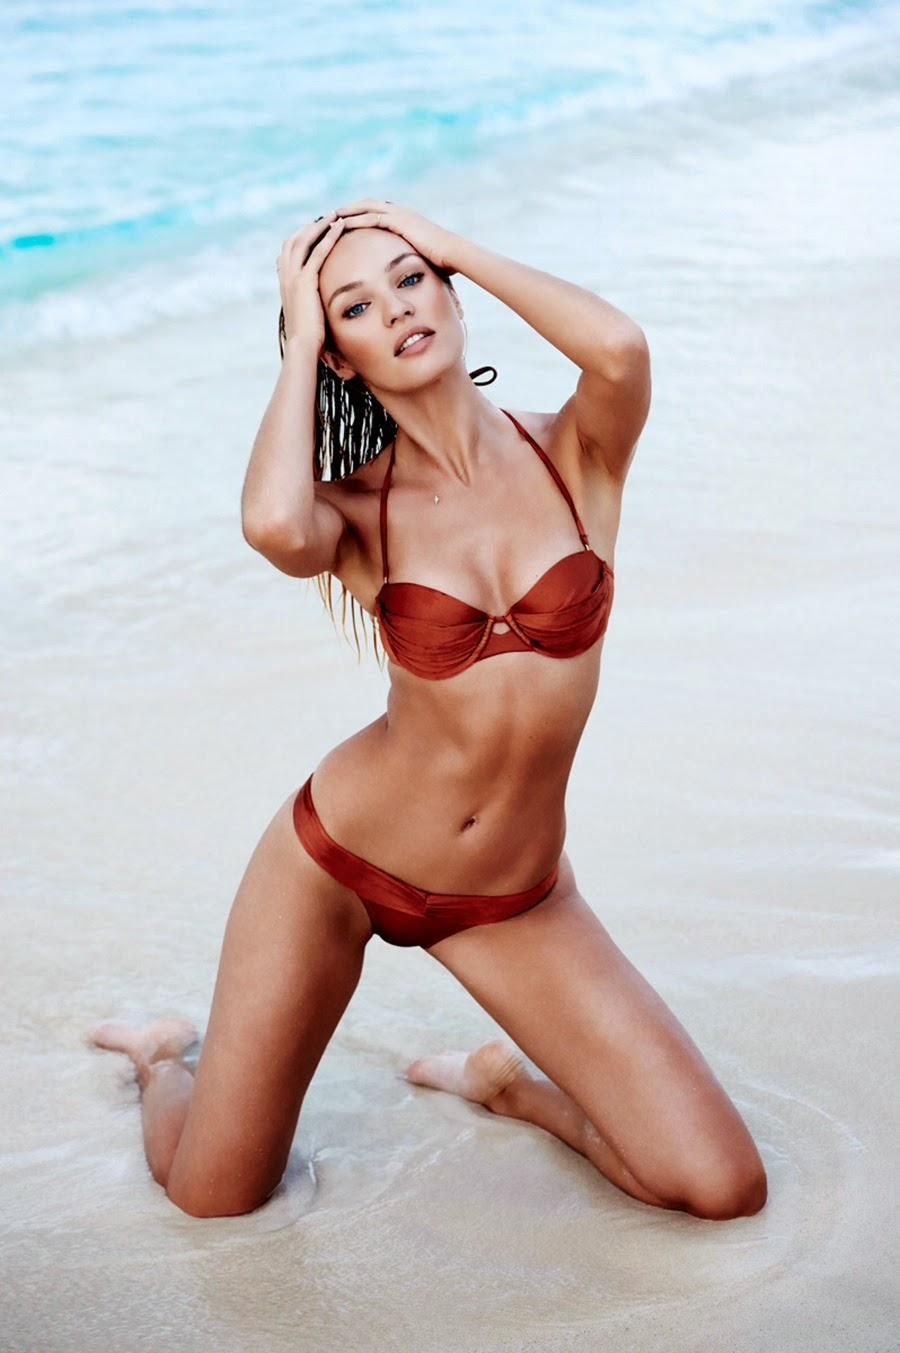 Candice-Swanepoel-Paola-Murray-Swimwear-11.jpg